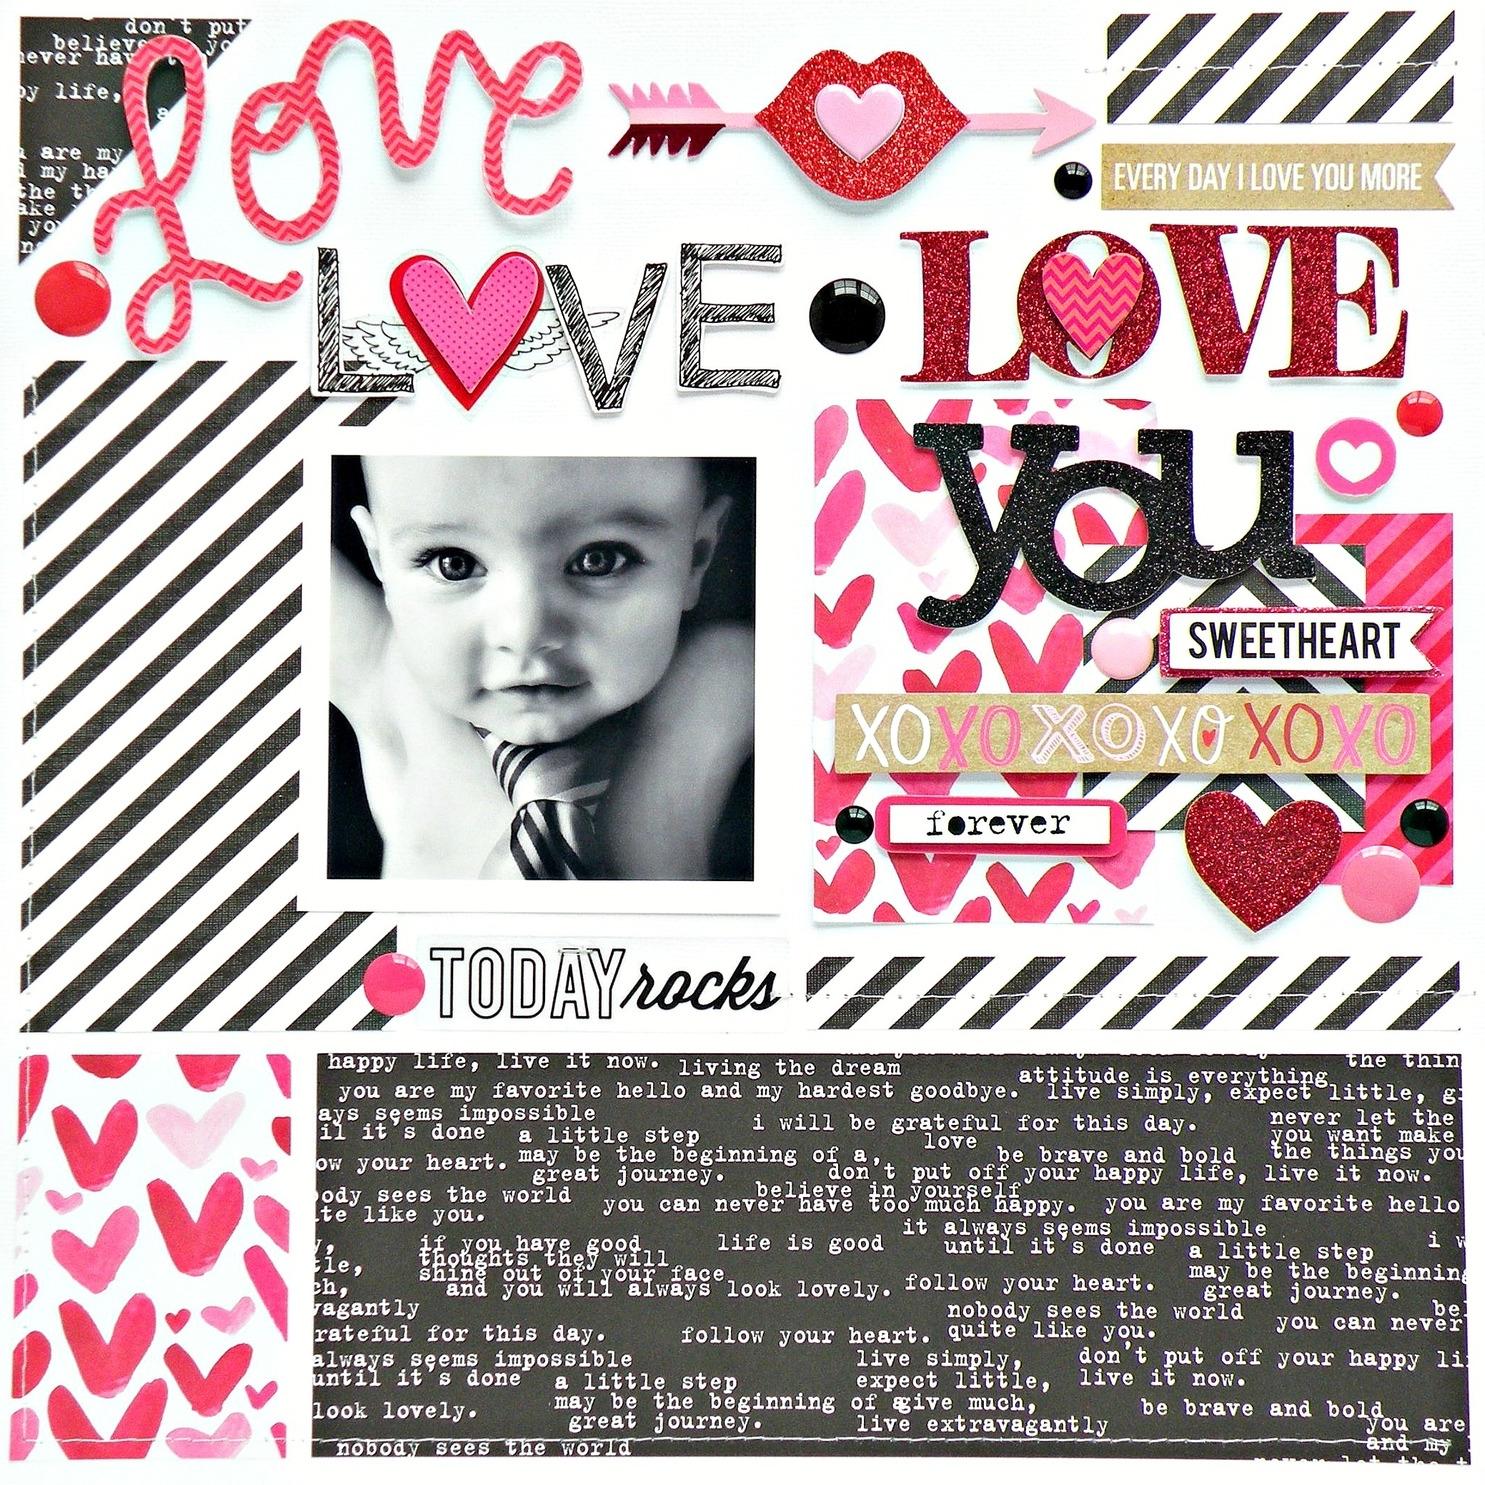 'Love Love Love You' scrapbook layout